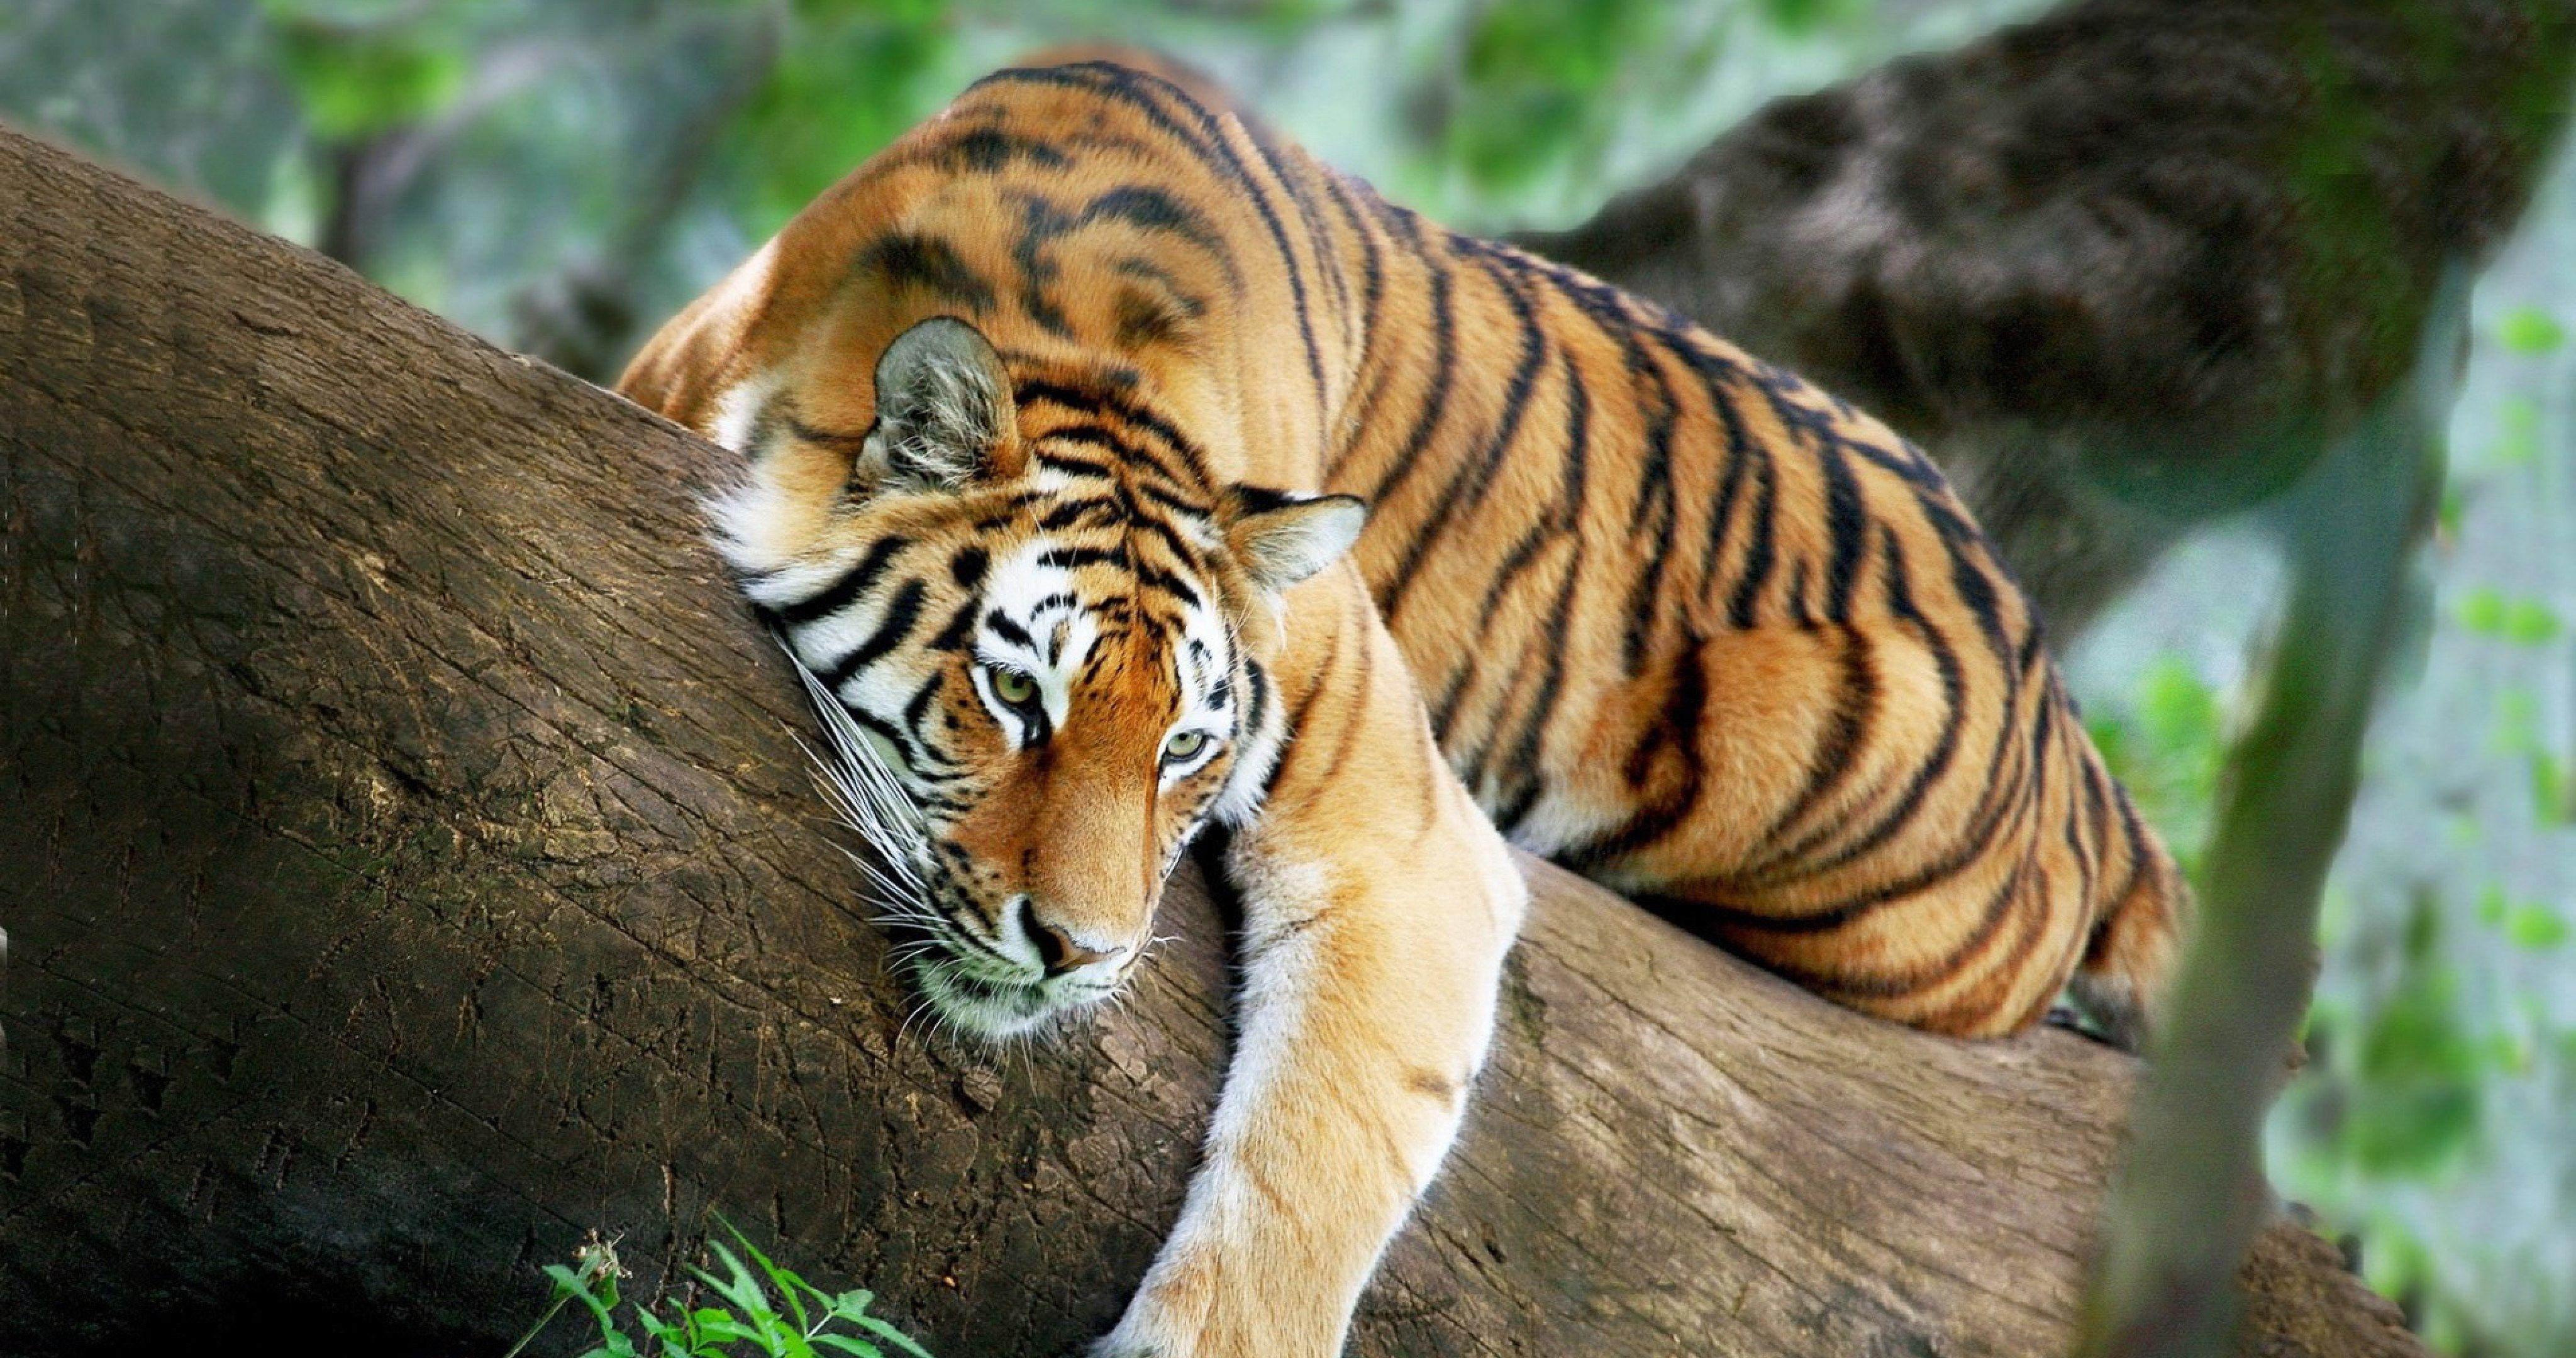 tiger recreation 4k ultra hd wallpaper Animals beautiful